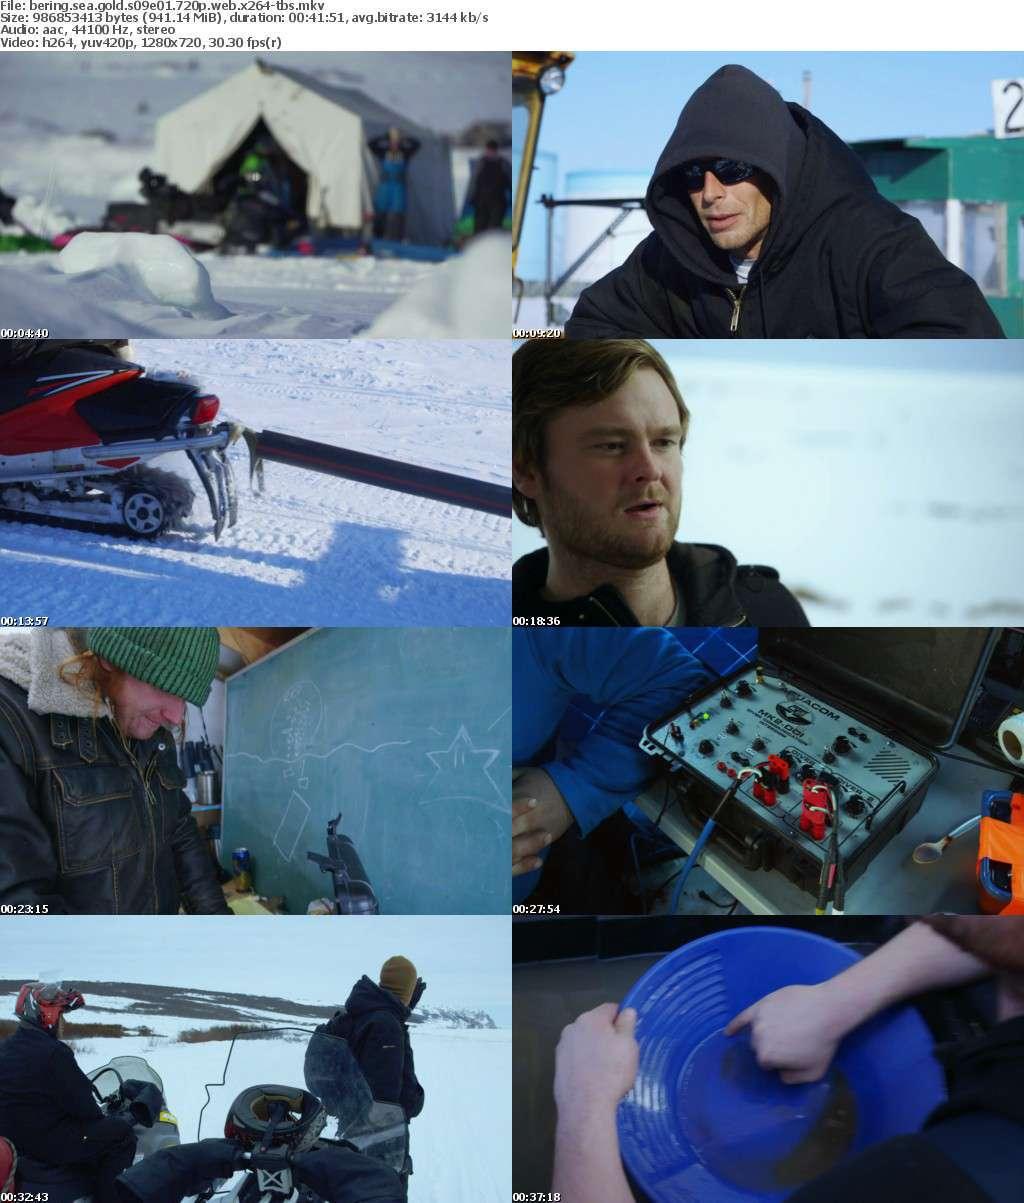 Bering Sea Gold S09E01 720p WEB x264-TBS